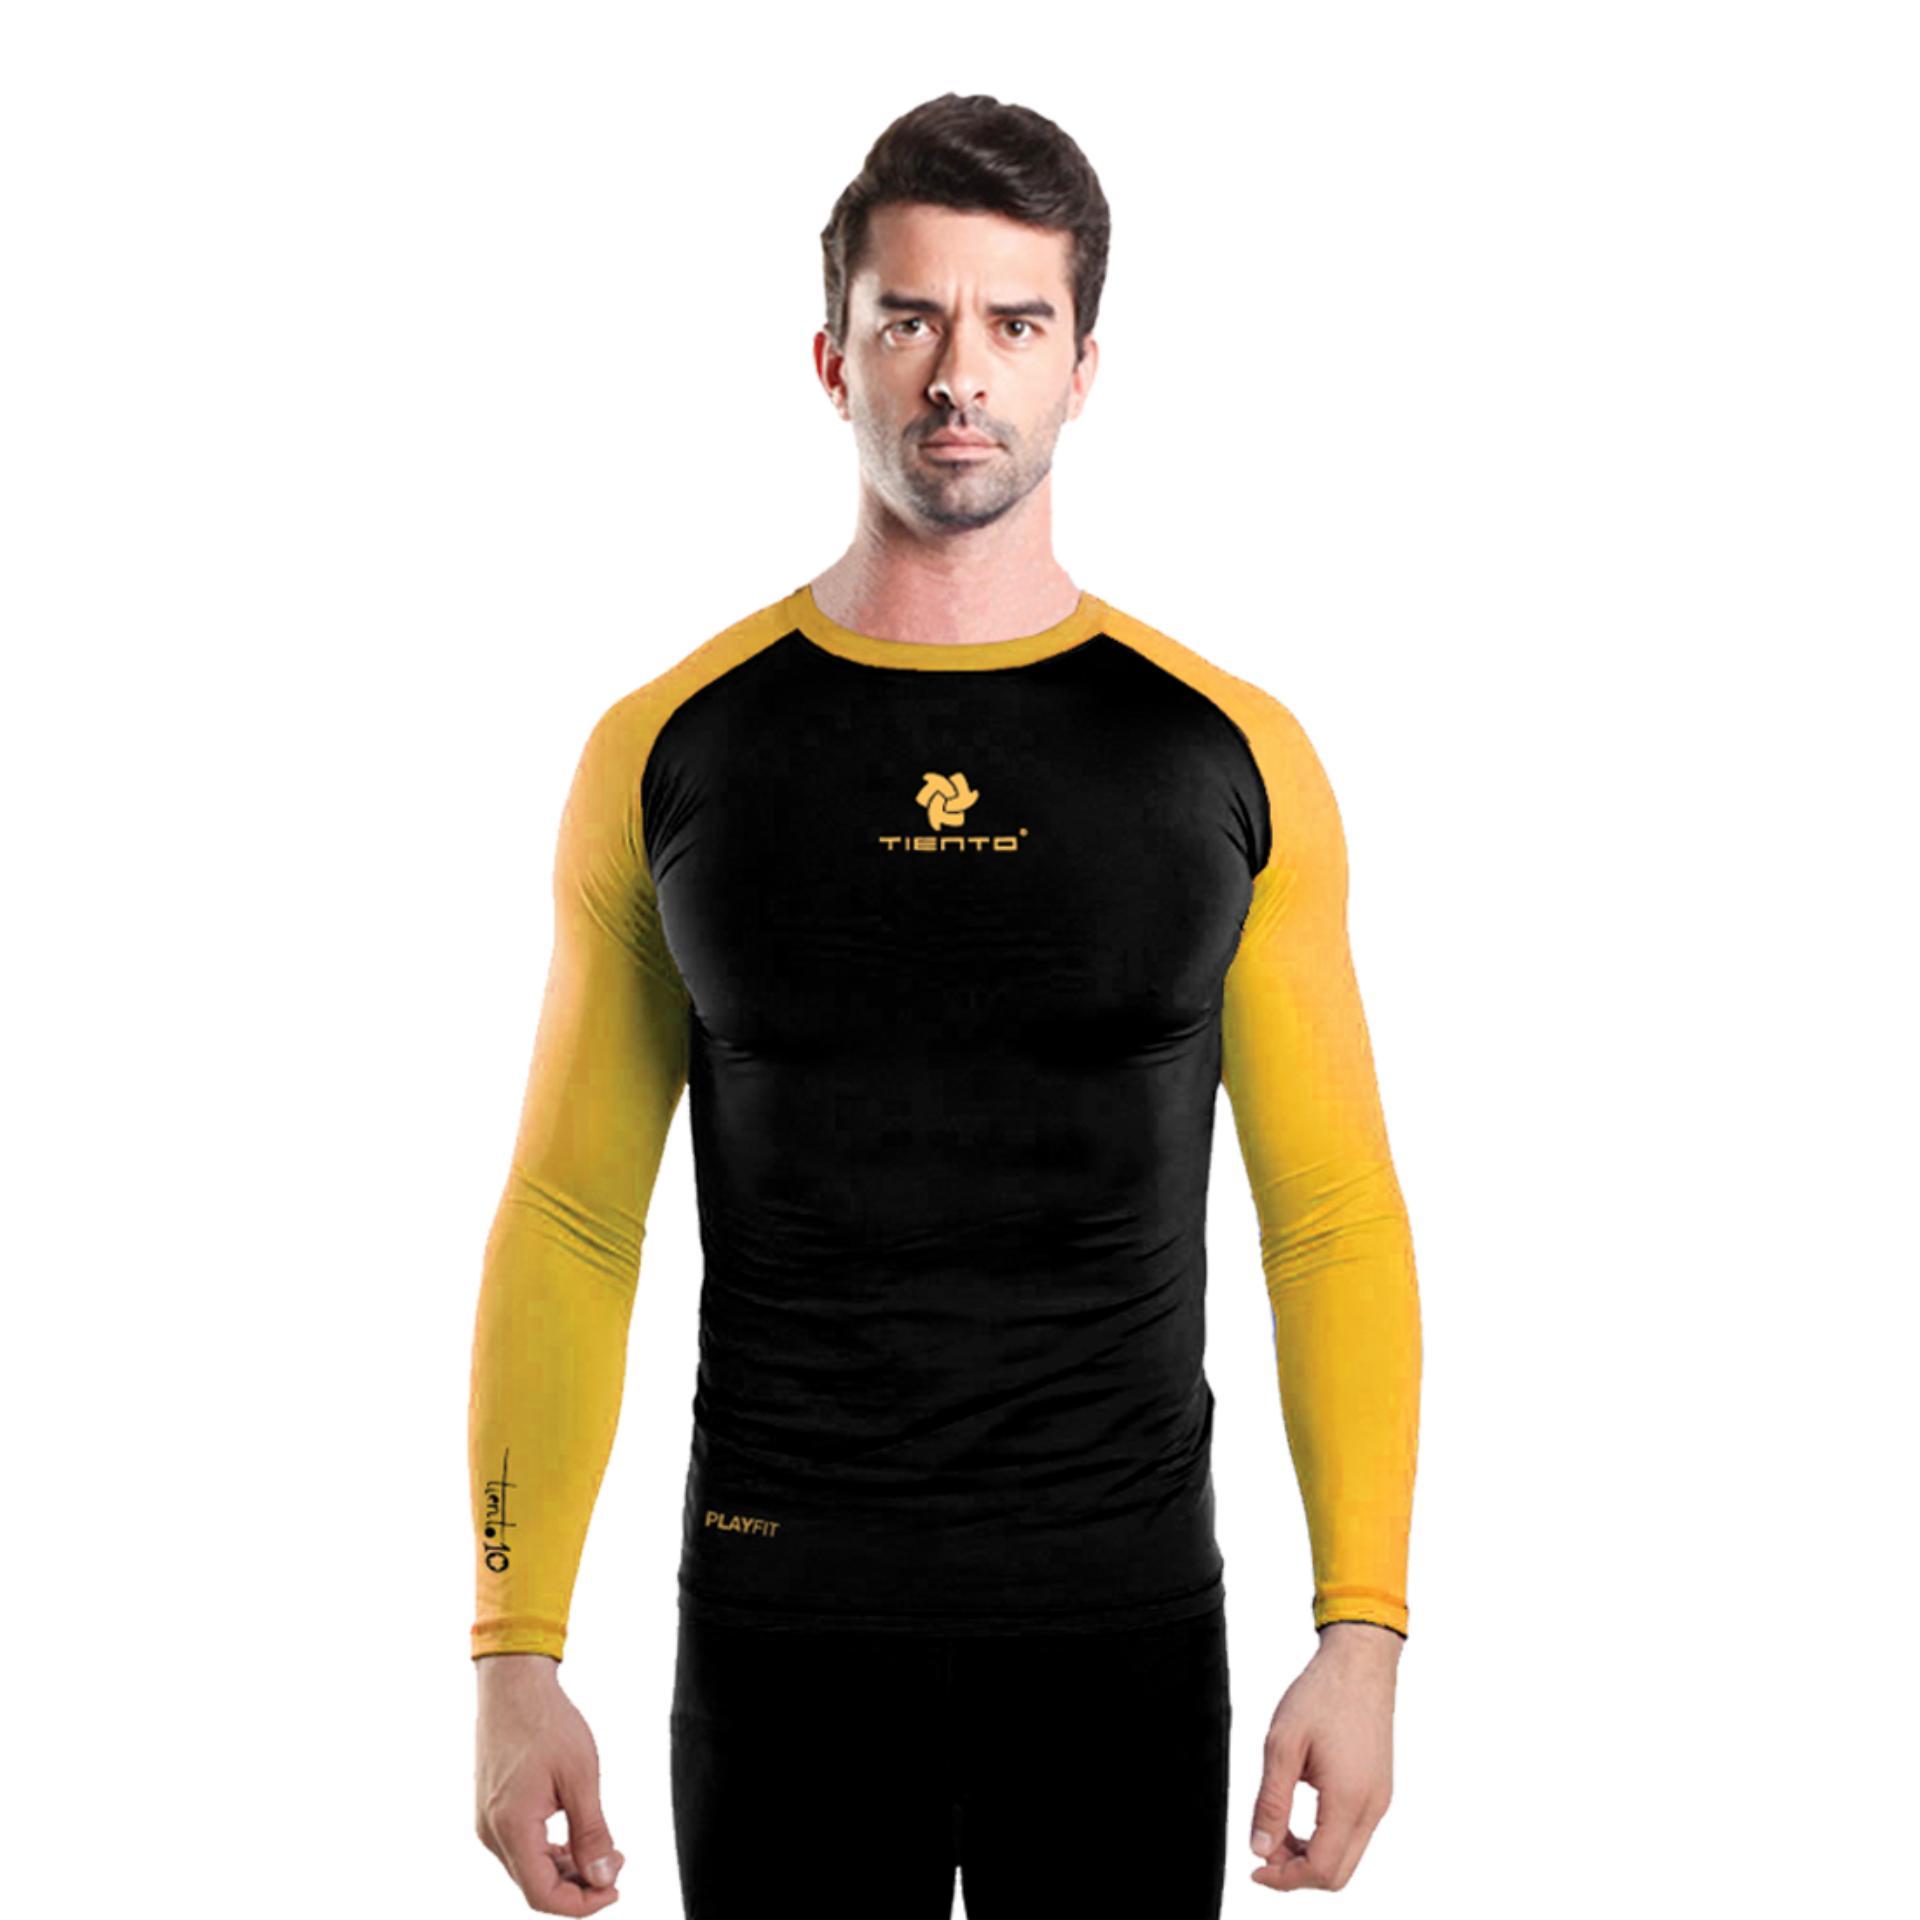 Tiento Baselayer Long Sleeve Black Yellow Baju Kaos Lengan Panjang Ketat Manset Rashguard Compression Base Layer Olahraga Lari Sepak Bola Futsal Voli Running Renang Diving Sepeda Golf Original